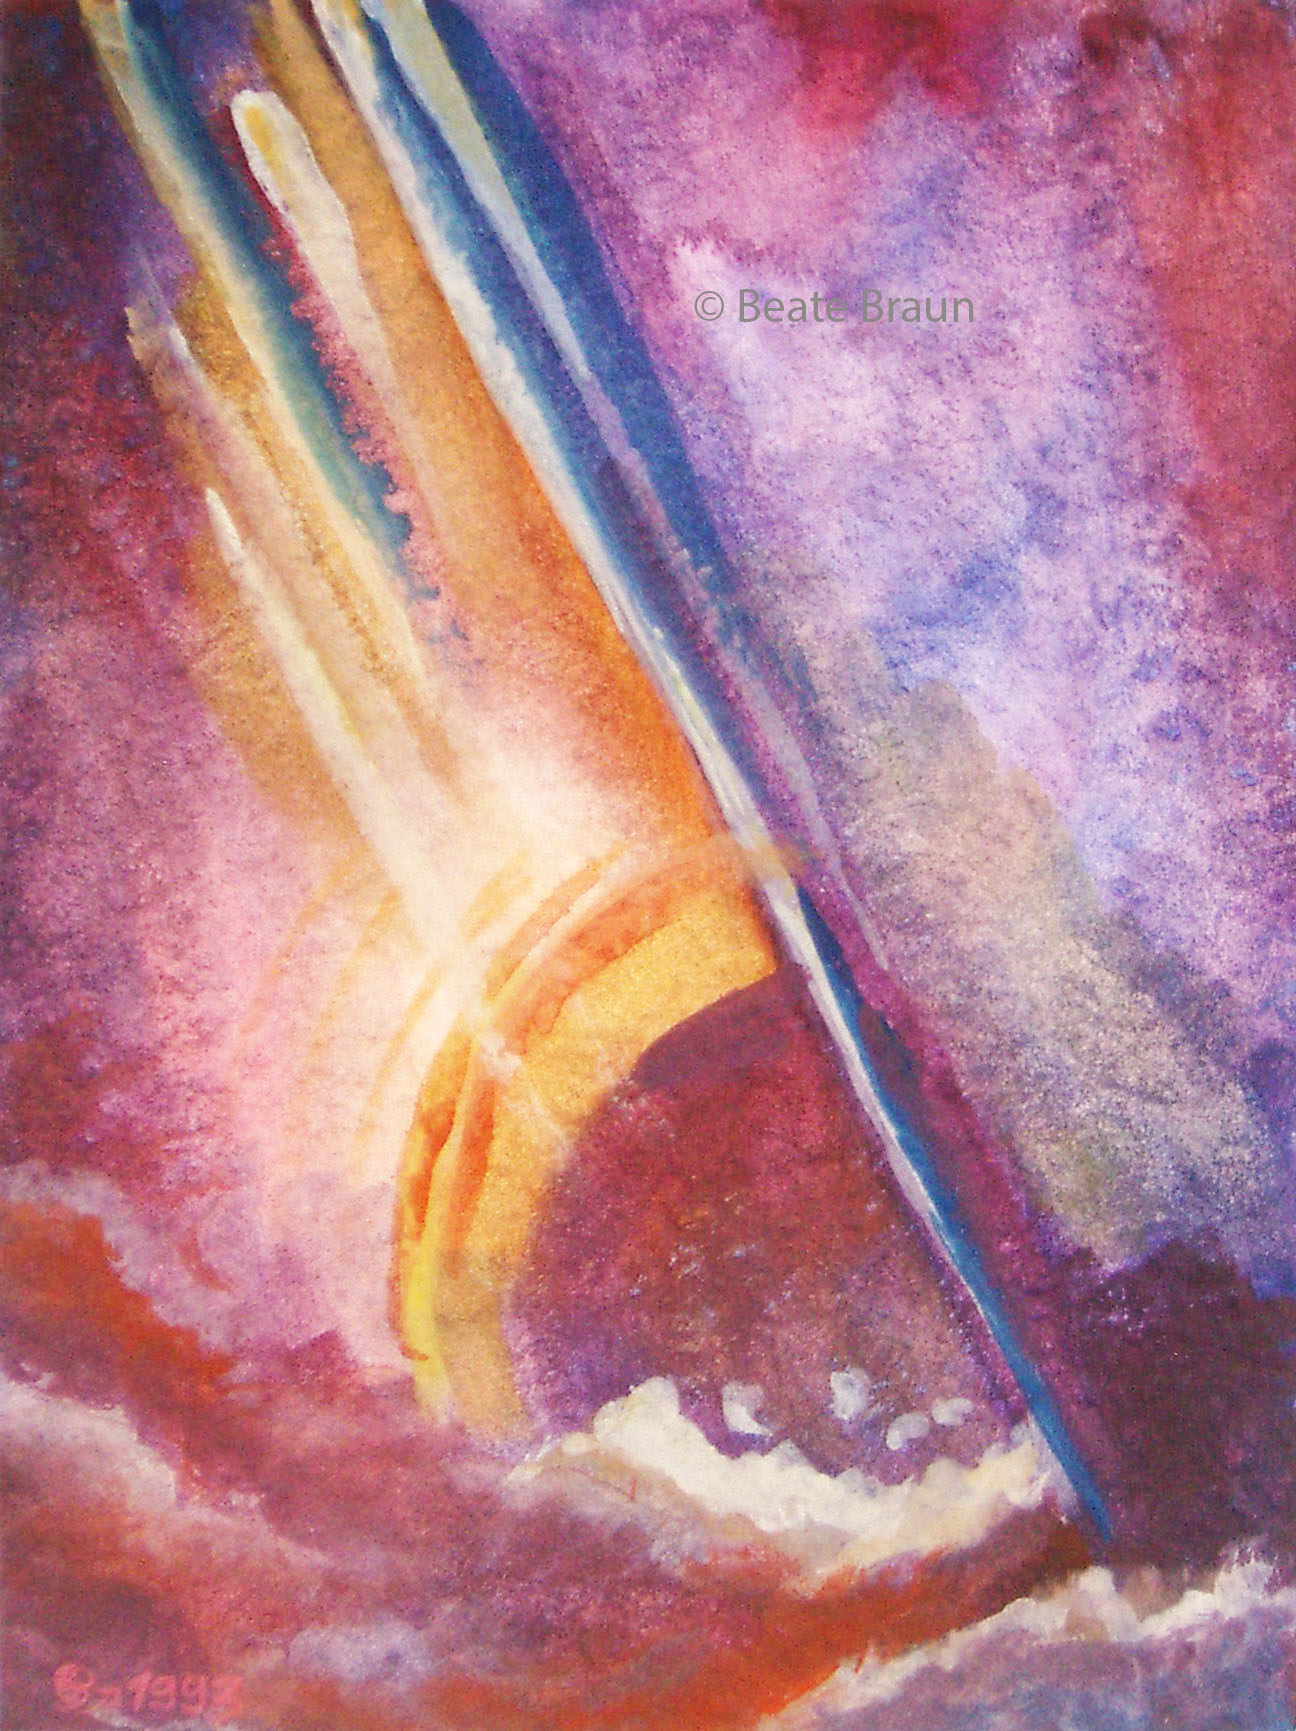 Sonne im Meer | 18 x 24 cm | Aquarell | 1998